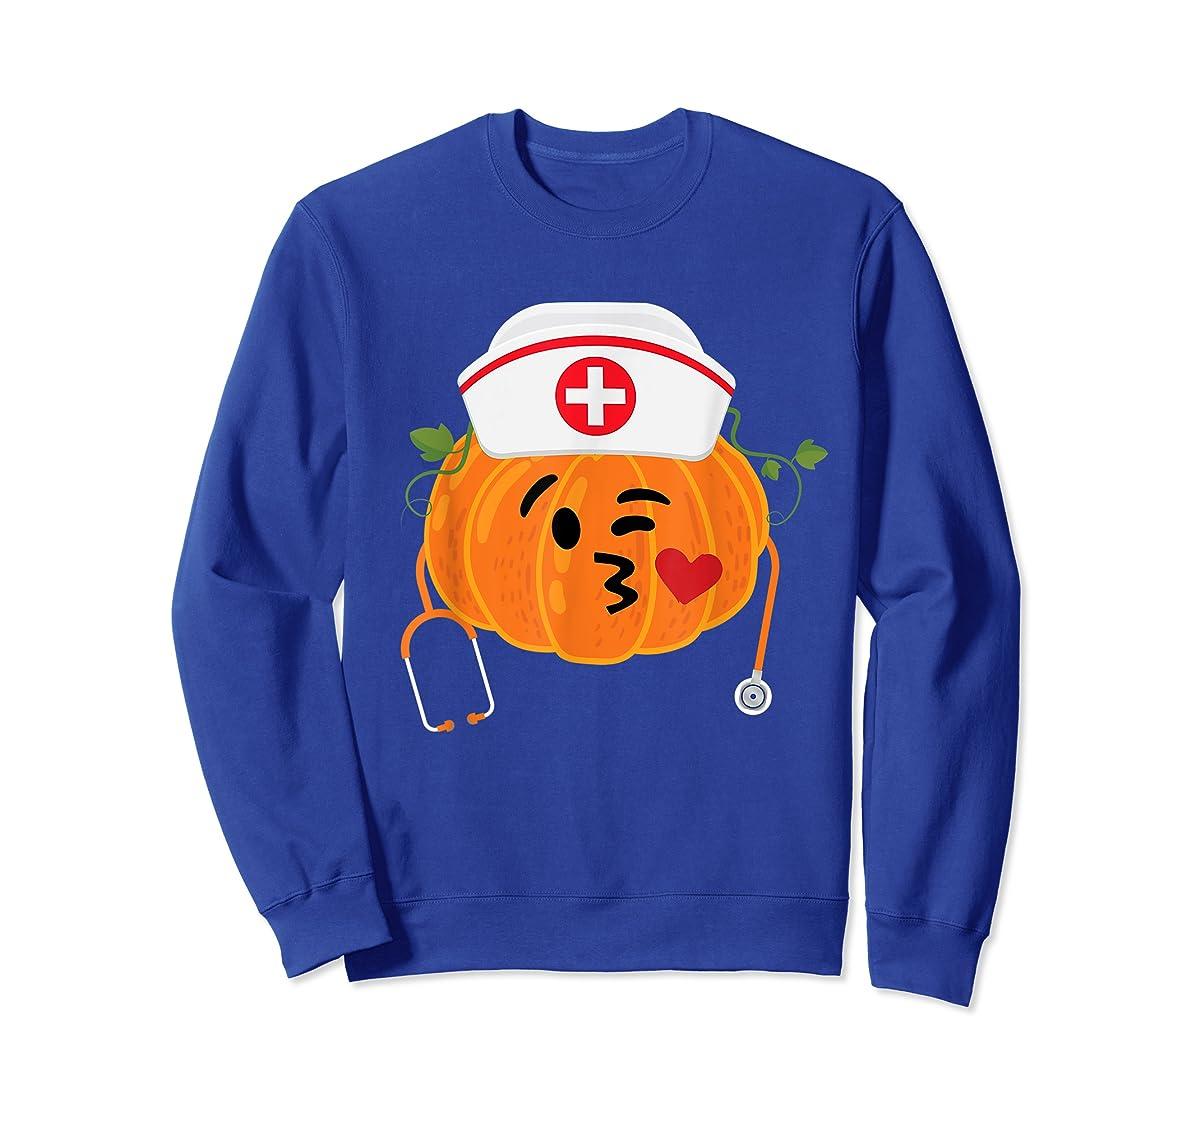 Nurse Stethoscope Pumpkin Funny Nursing Halloween Gift T-Shirt-Sweatshirt-Royal